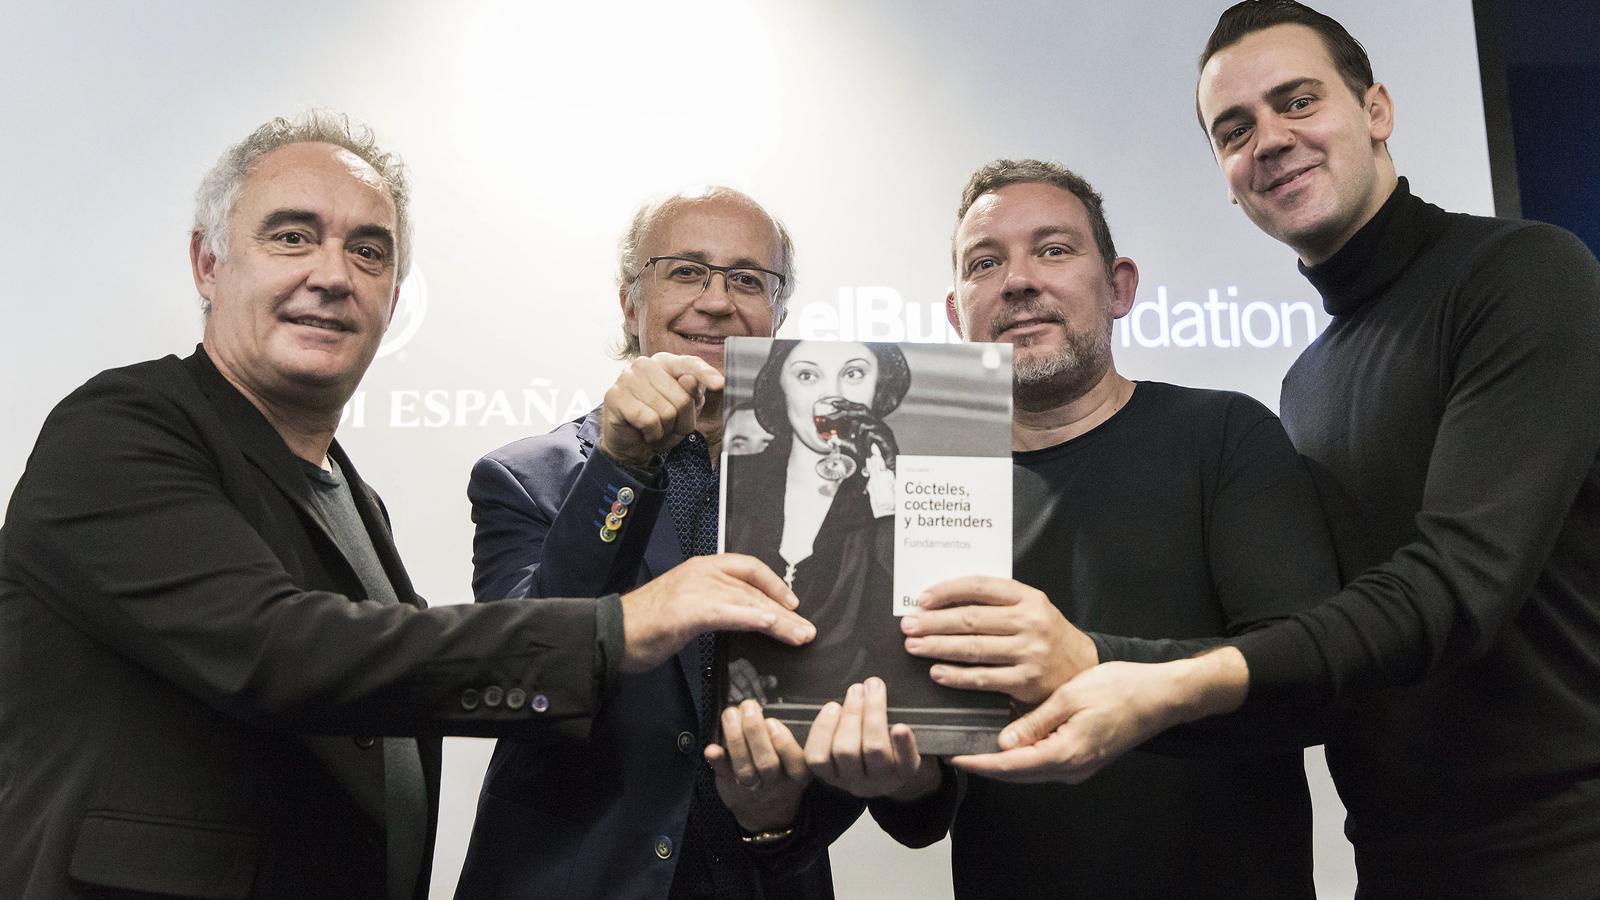 Ferran Adrià, Javier de las Muelas, Albert Adrià i Simone Caporale durant la presentació